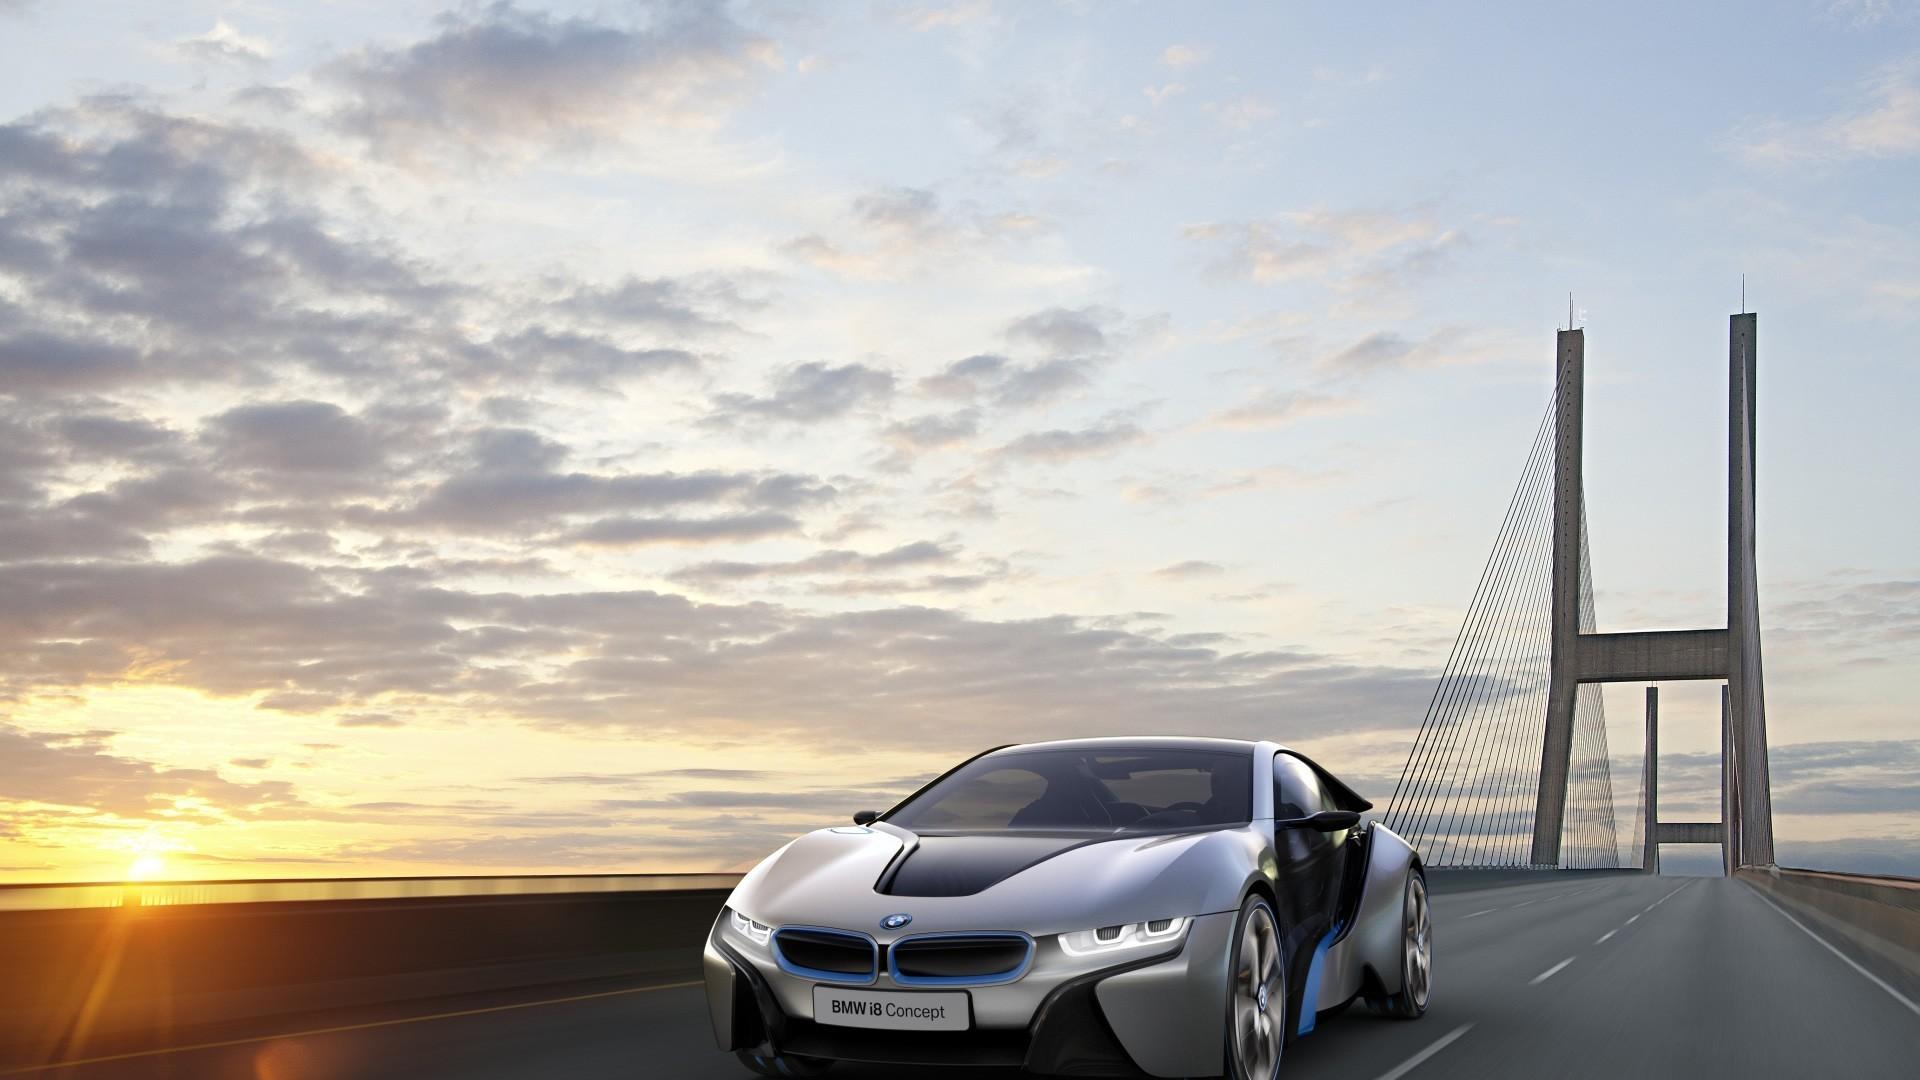 BMW, Bridge, Car Wallpapers HD / Desktop and Mobile … ultra hd wallpapers  …